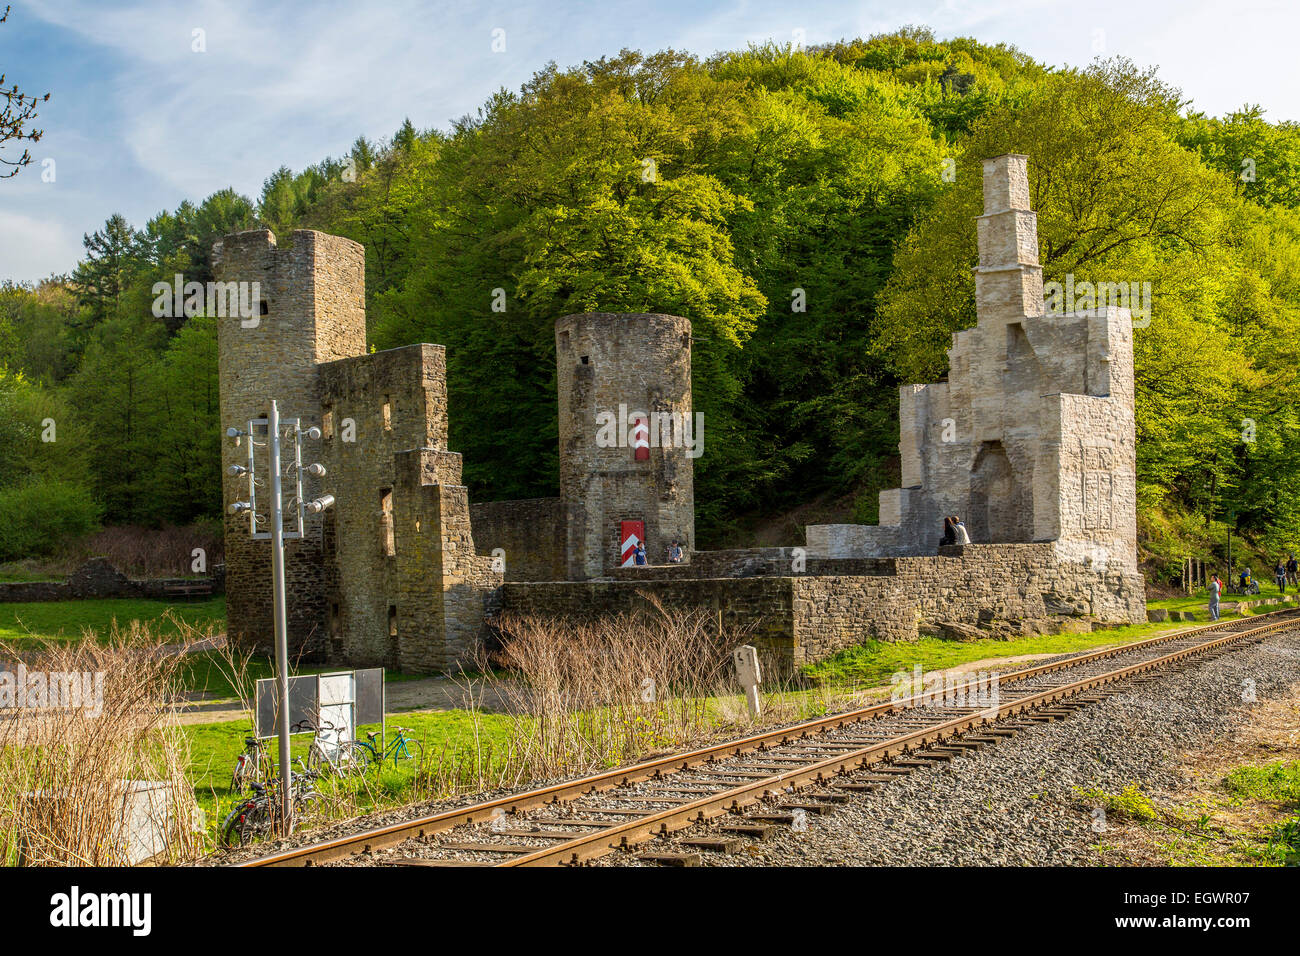 River Ruhr, ruin of Hardenstein castle, Witten, Germany, - Stock Image